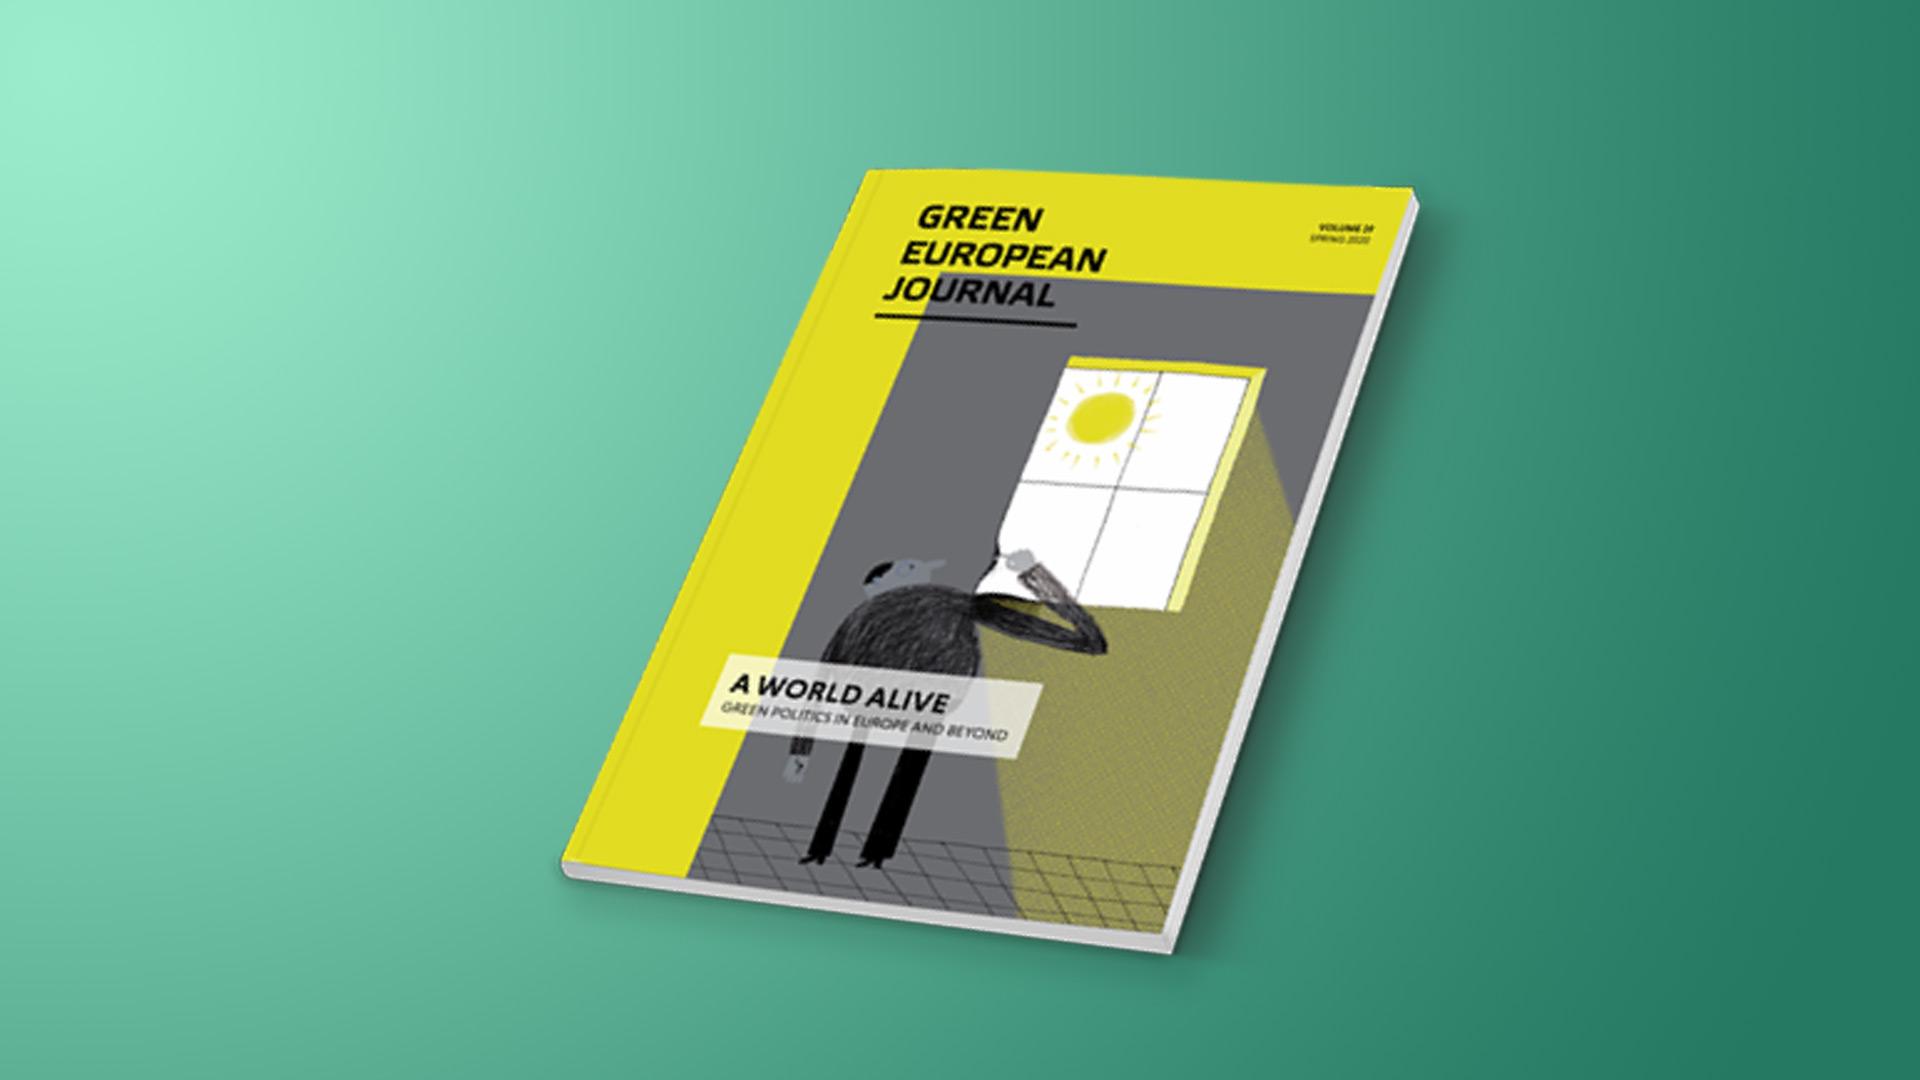 A WORLD ALIVE: Green Politics